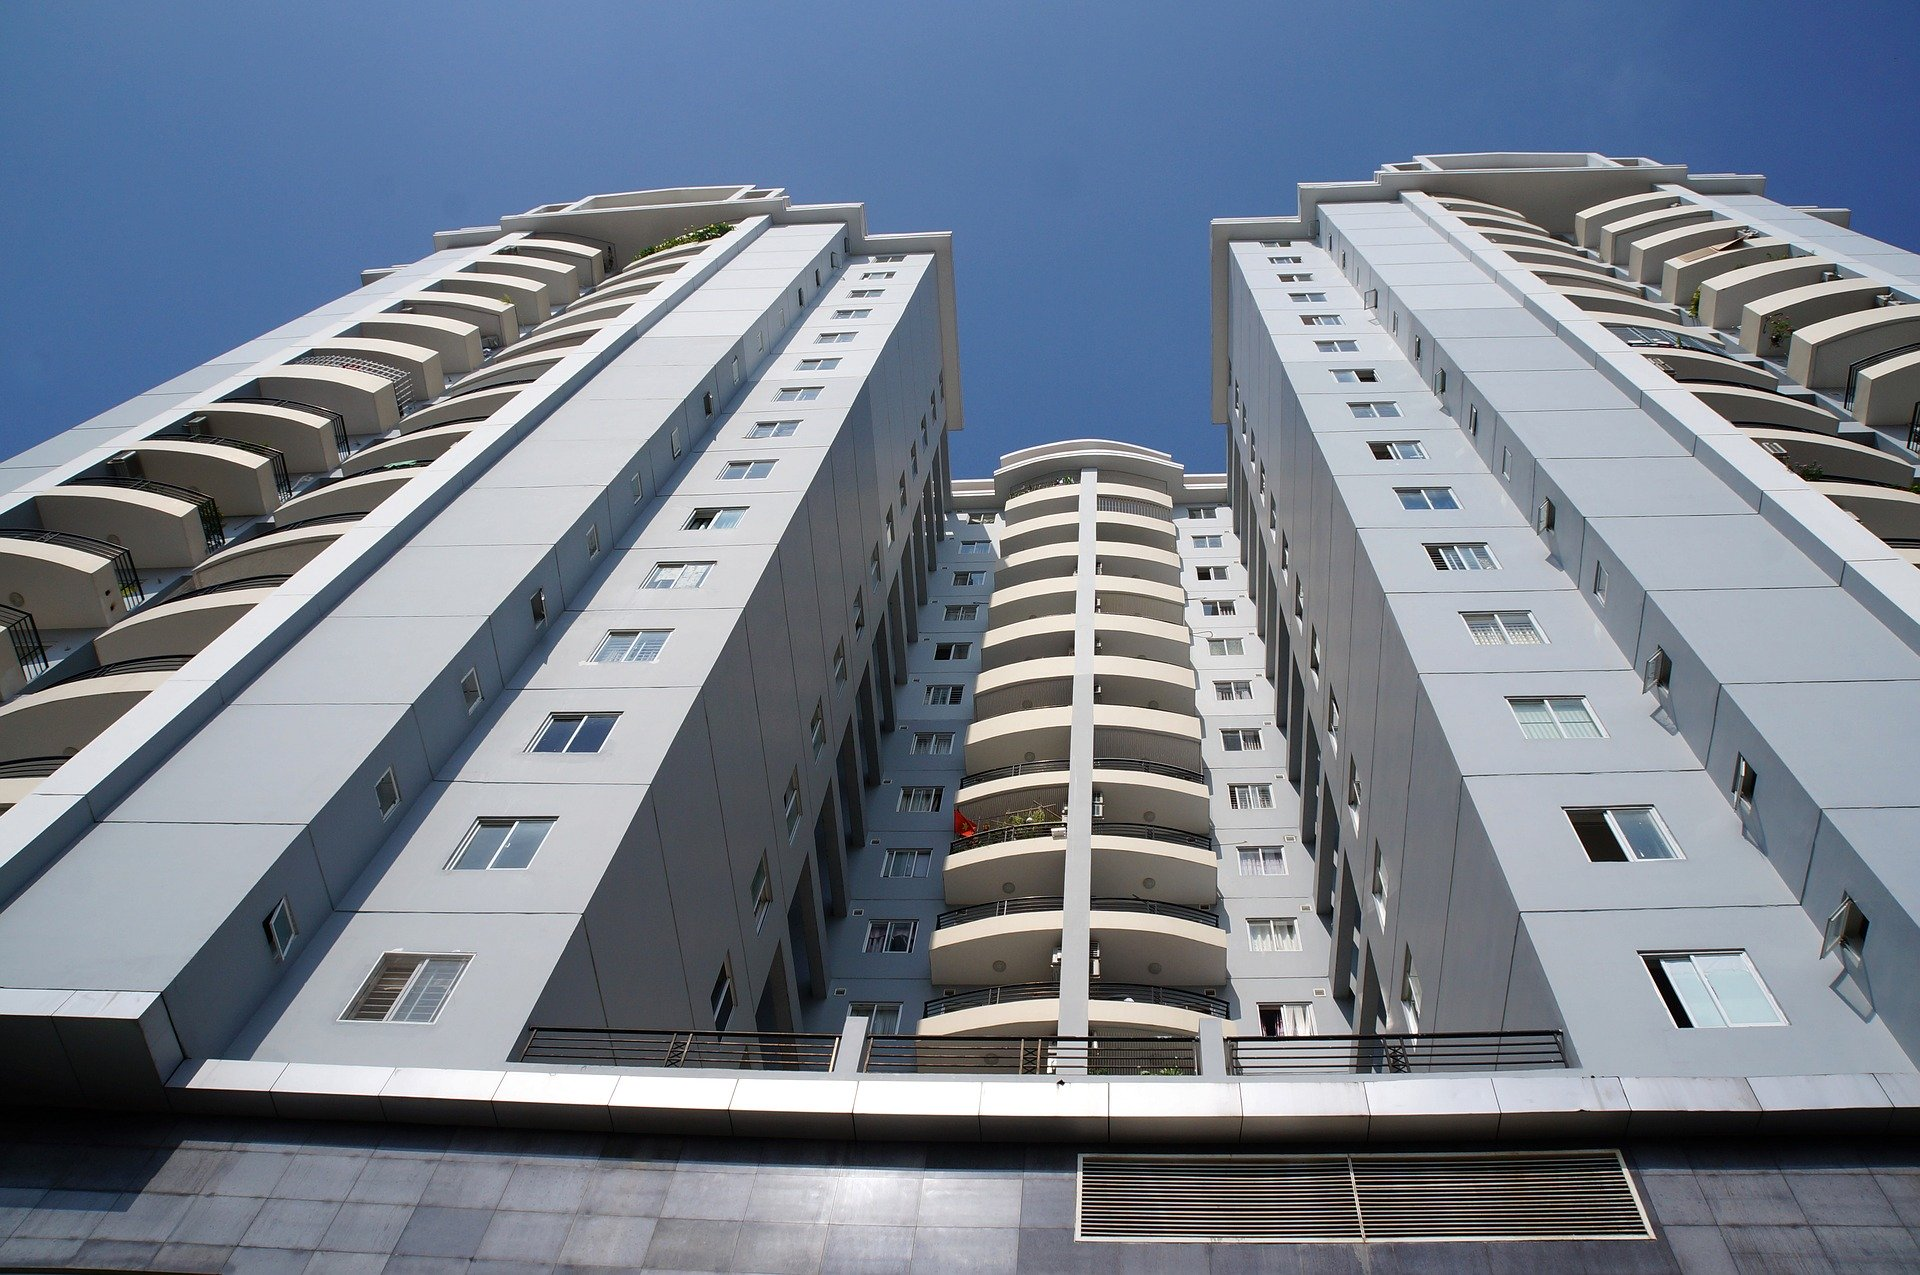 prédio de apartamentos, condomínio